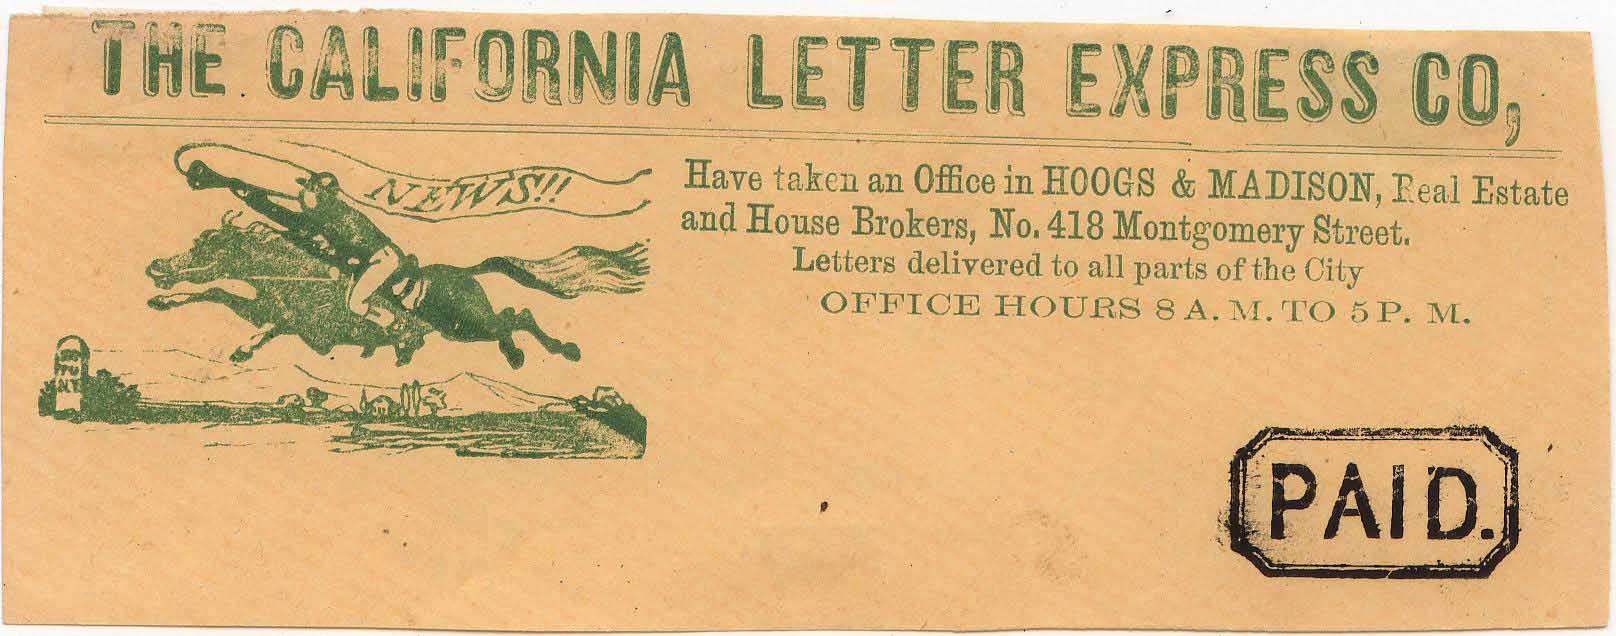 CaliforniaLetterExpress Frank Pony Green 0903 Mader